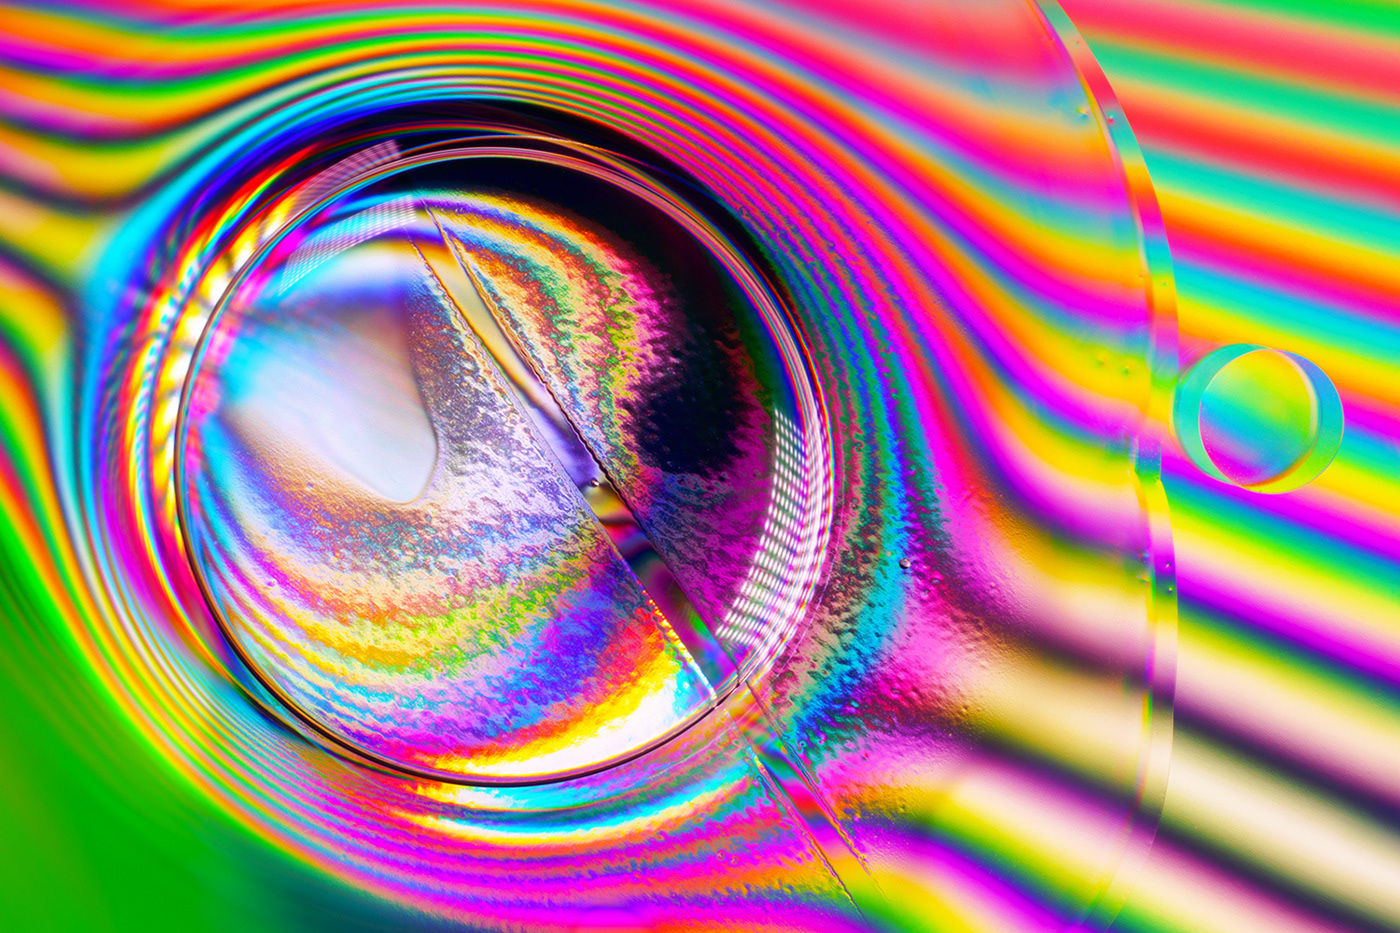 4K art colors holographic iridescent music rainbow sonyA7RIV video videoart